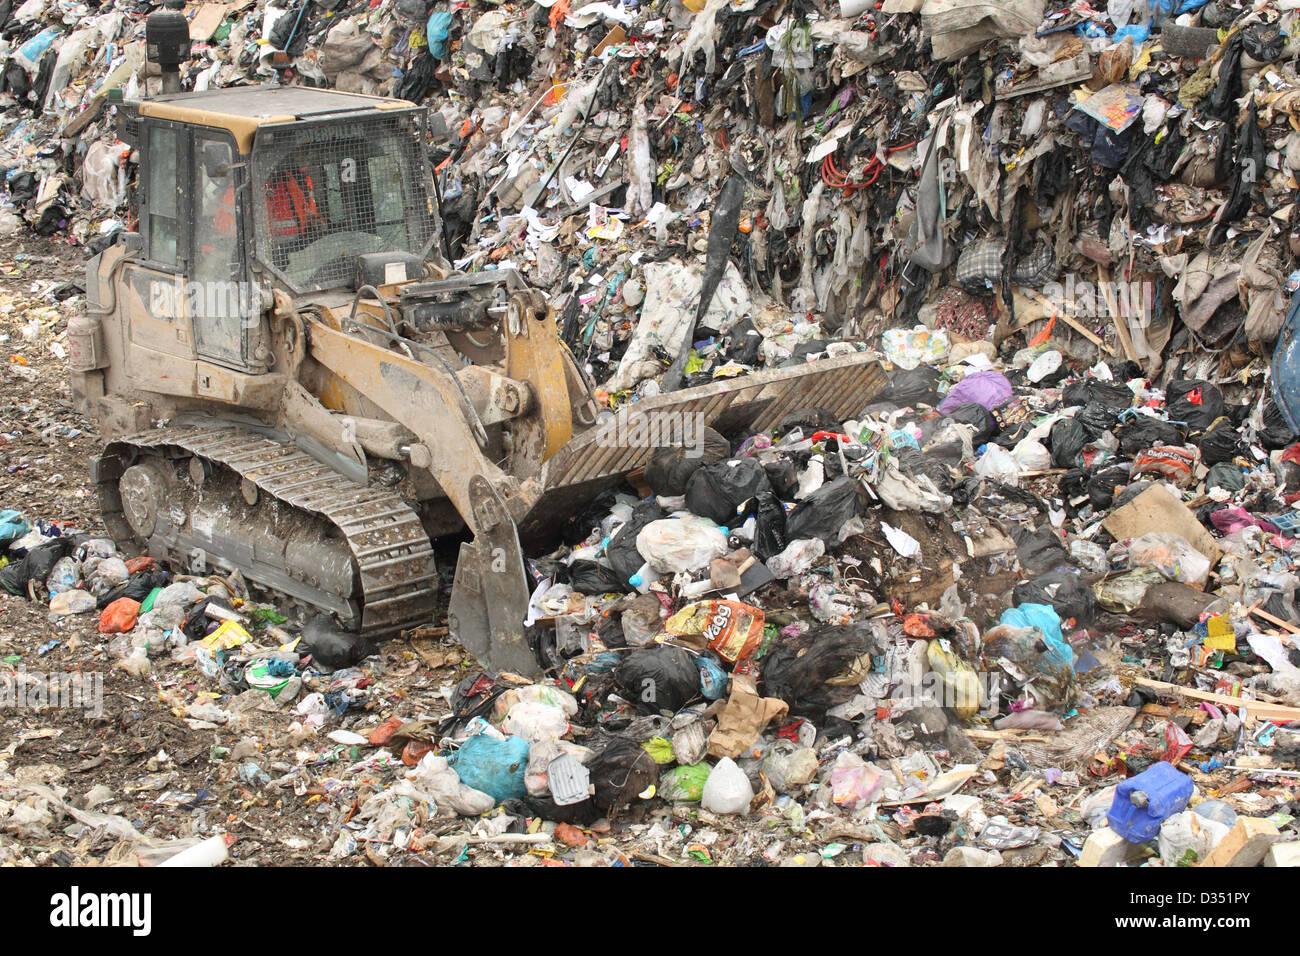 Bulldozer on landfill site, Dorset UK Febuary - Stock Image